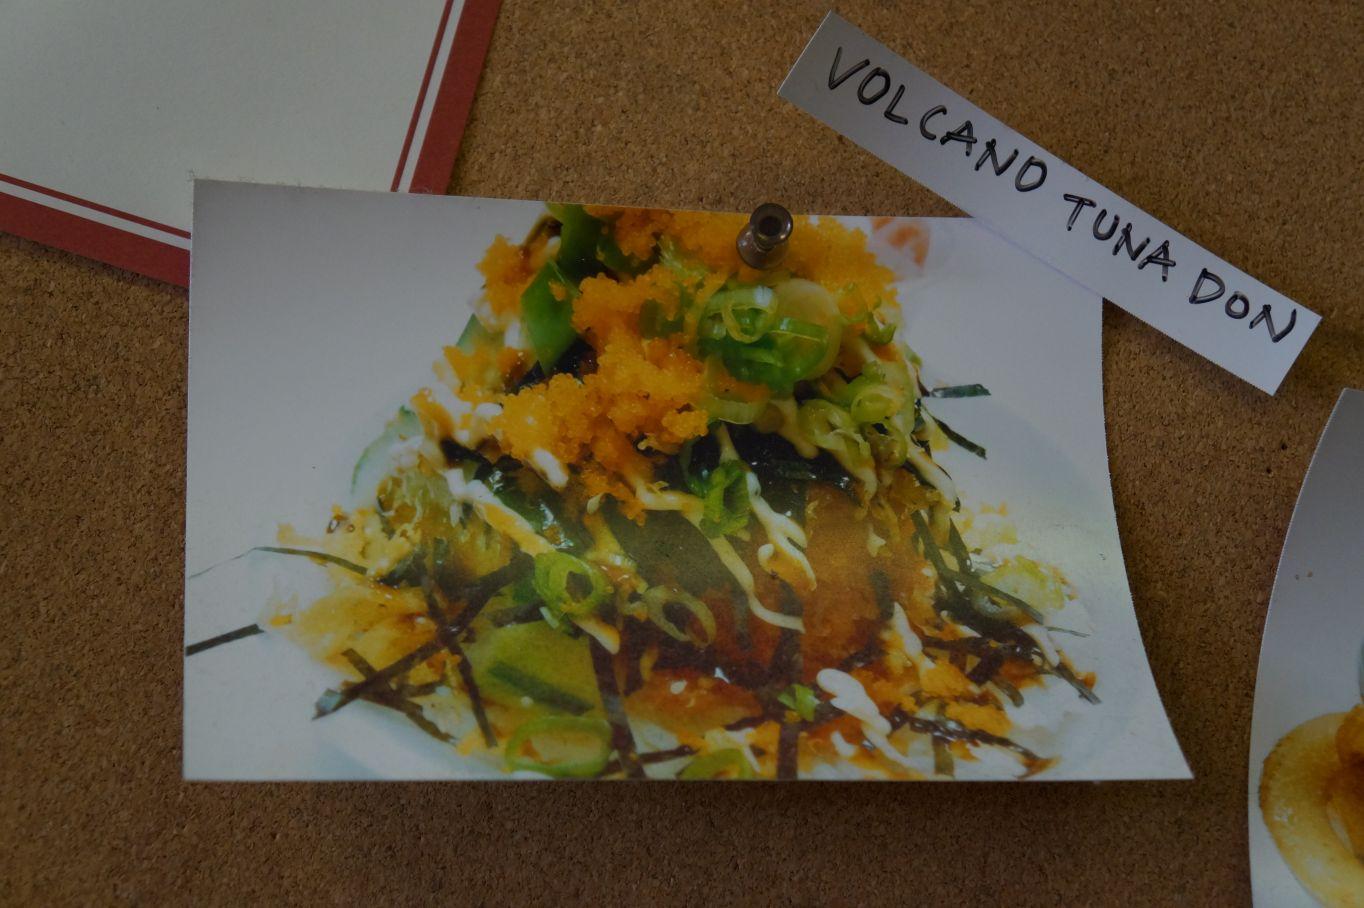 The tucson homeskillet volcano tuna don at samurai sushi for Sushi grade fish near me